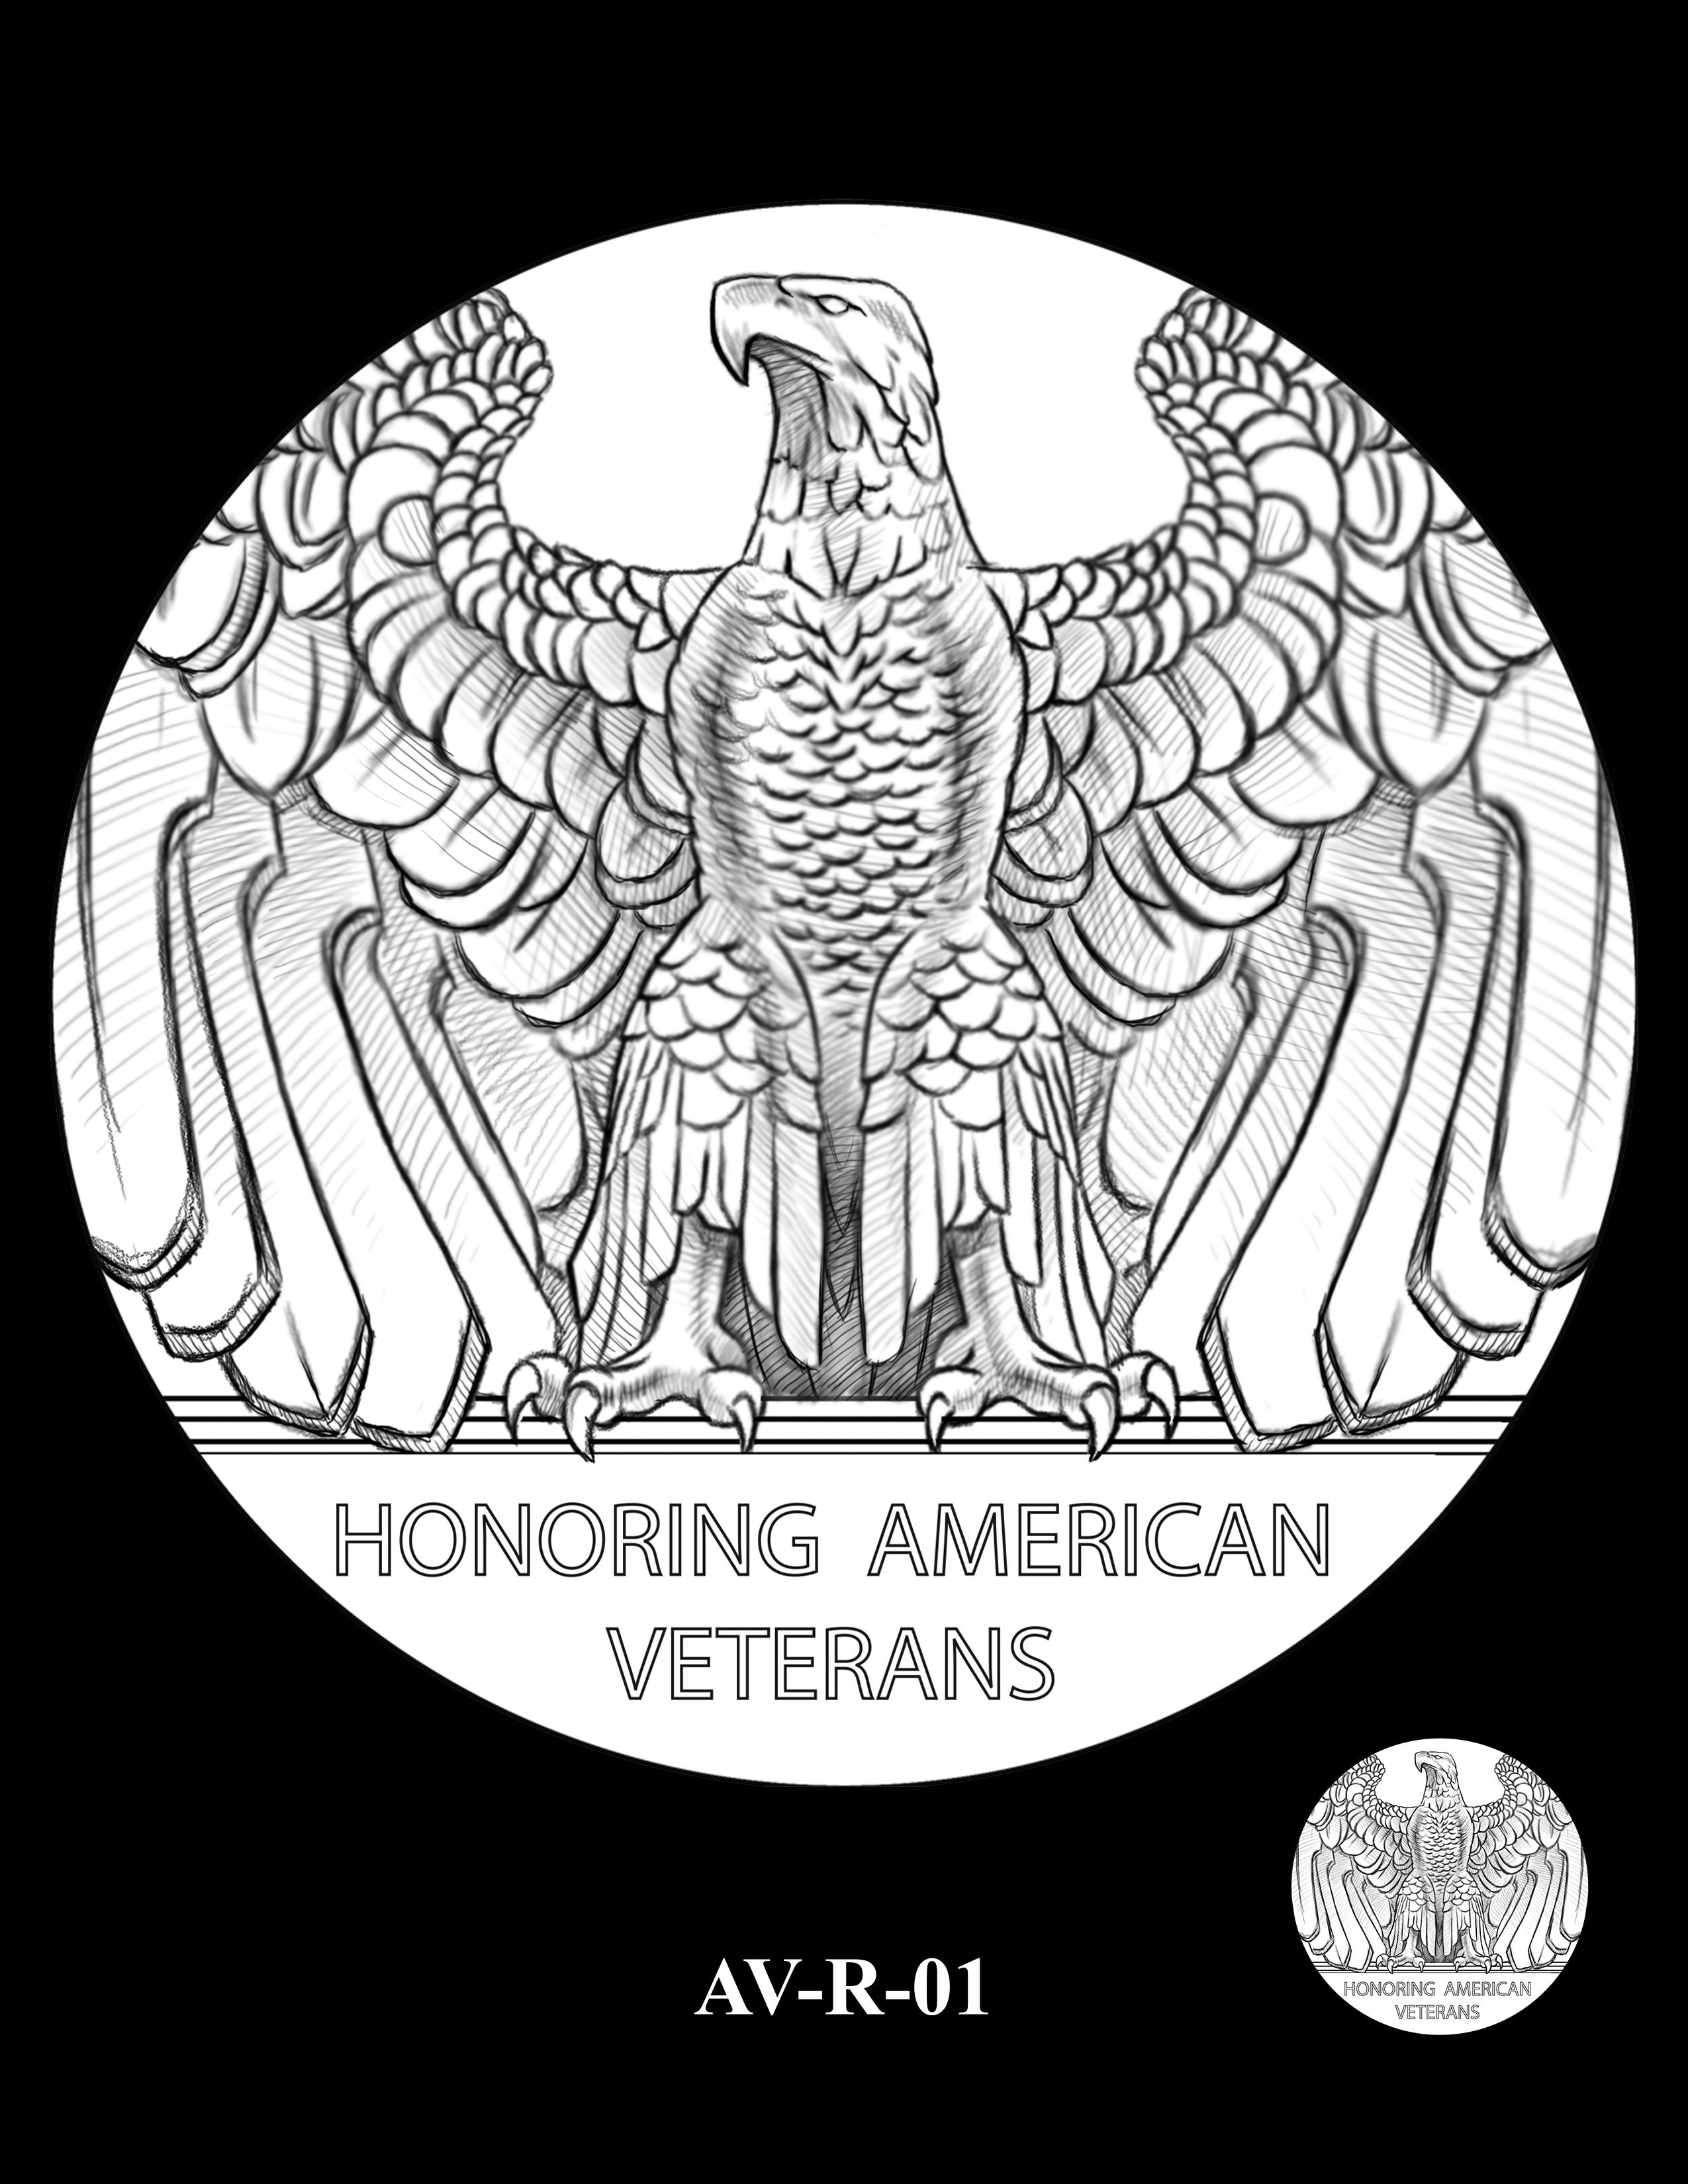 AV-R-01 - American Veterans Medal